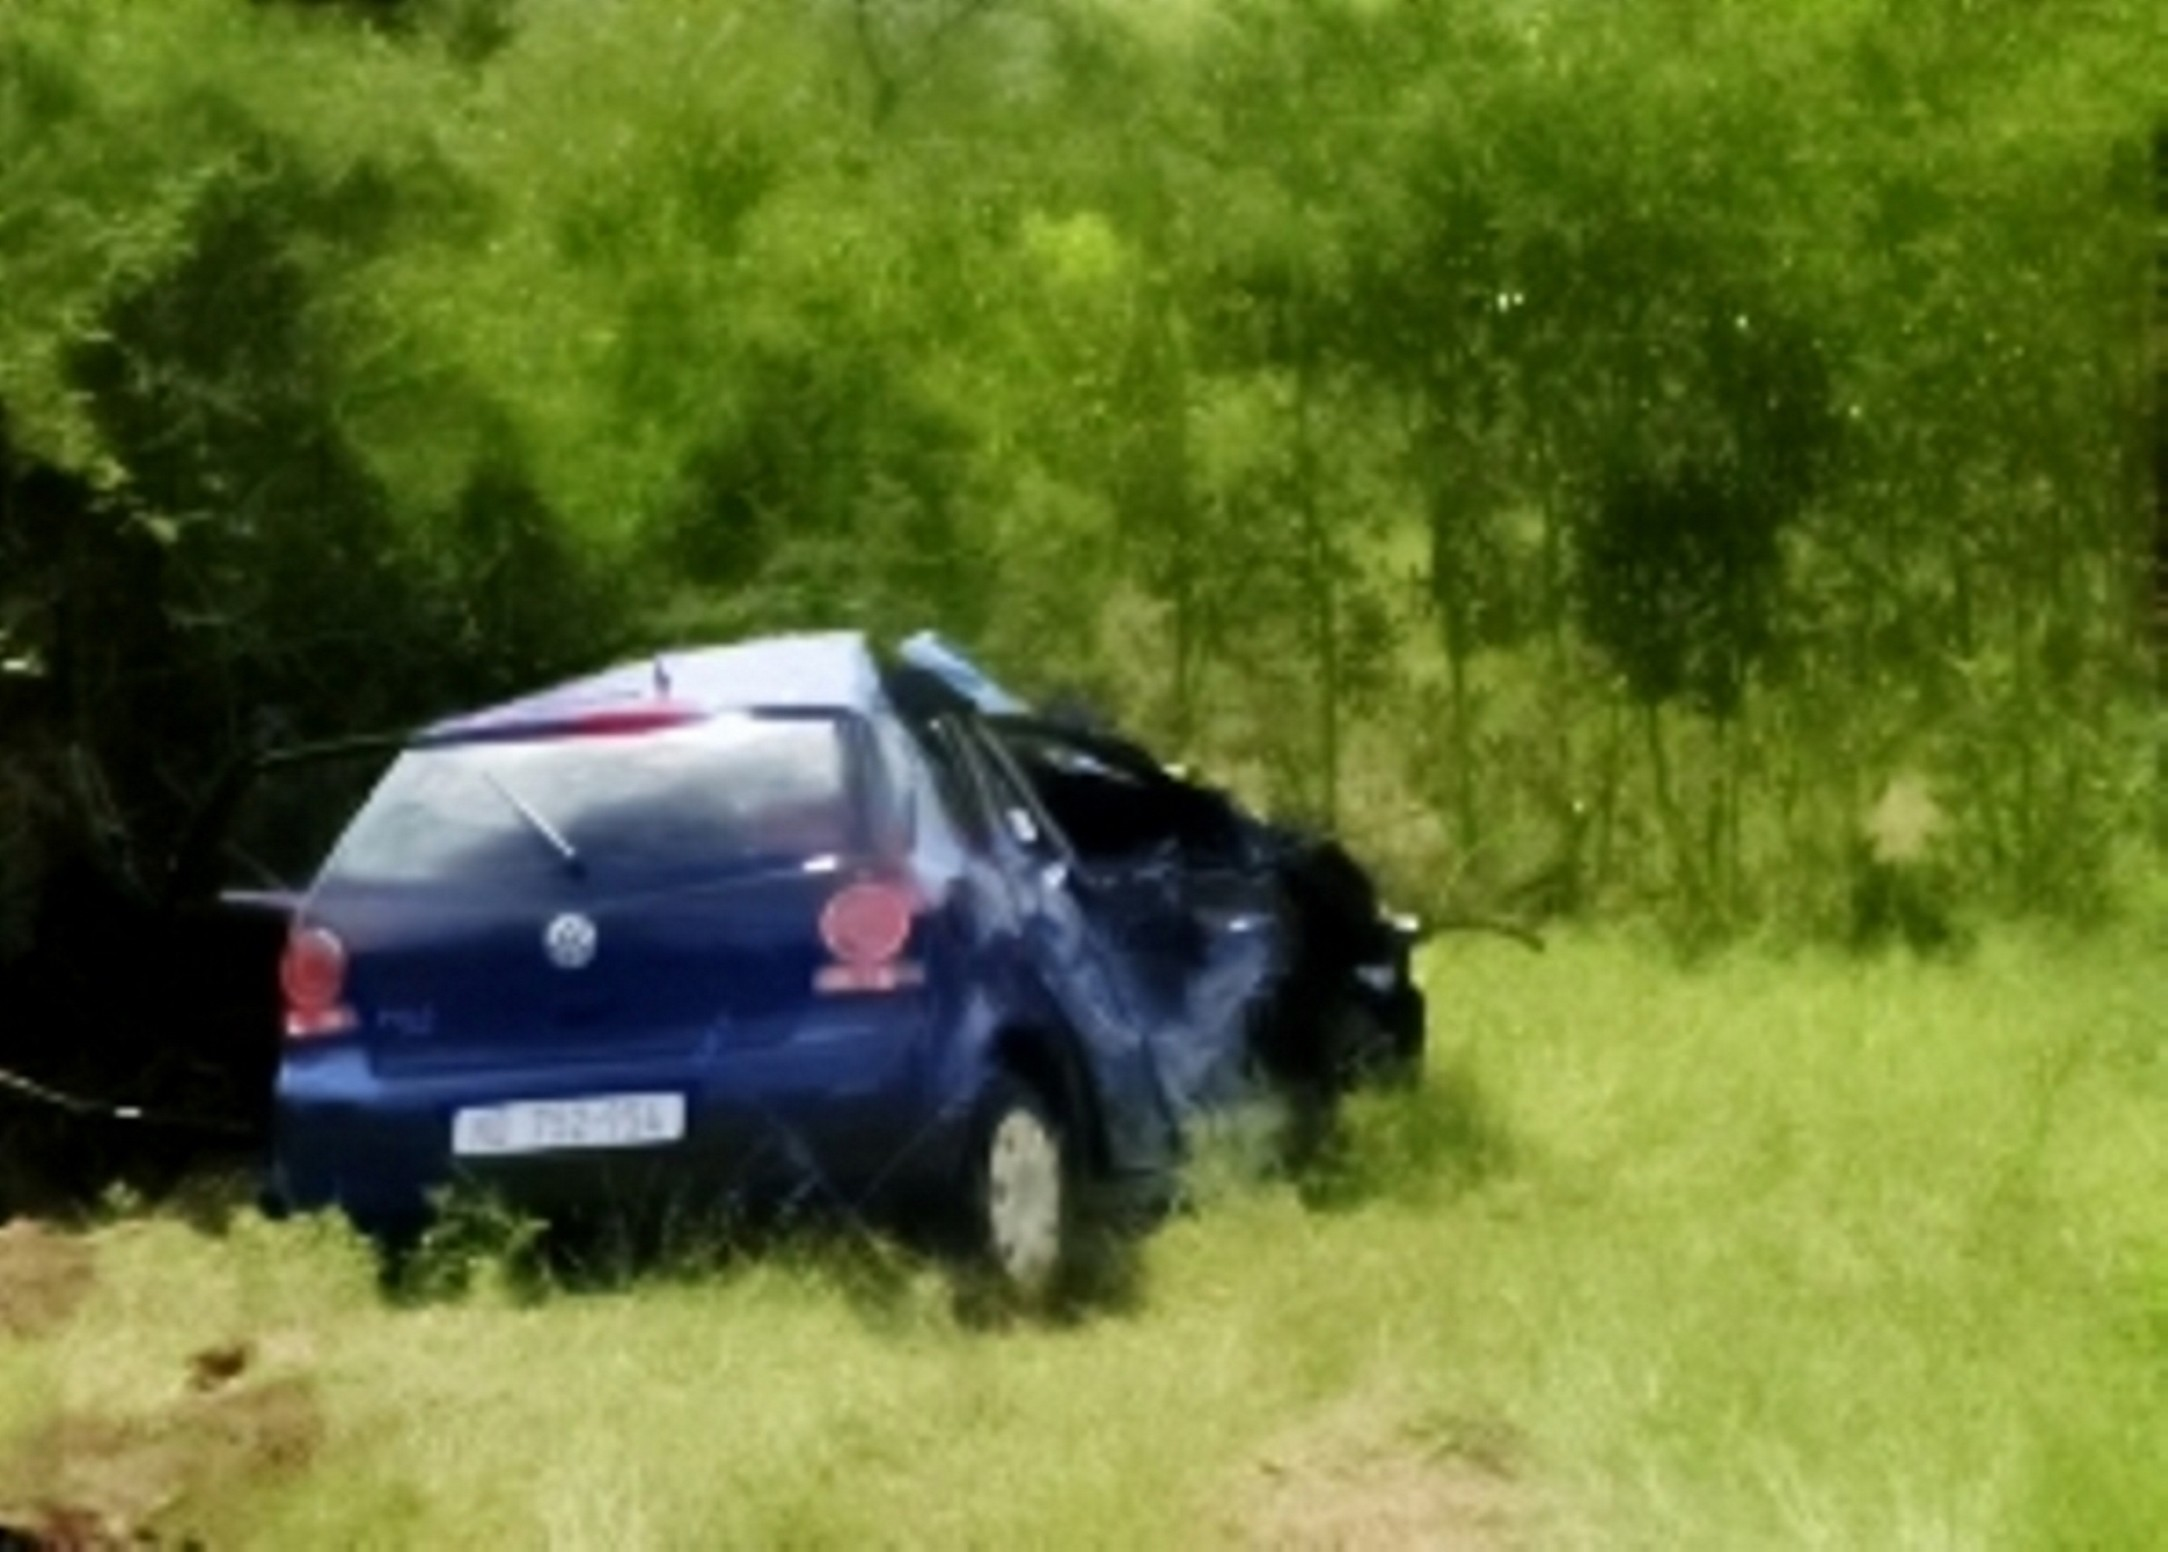 Geheel vernielde auto van de Britse toeriste.